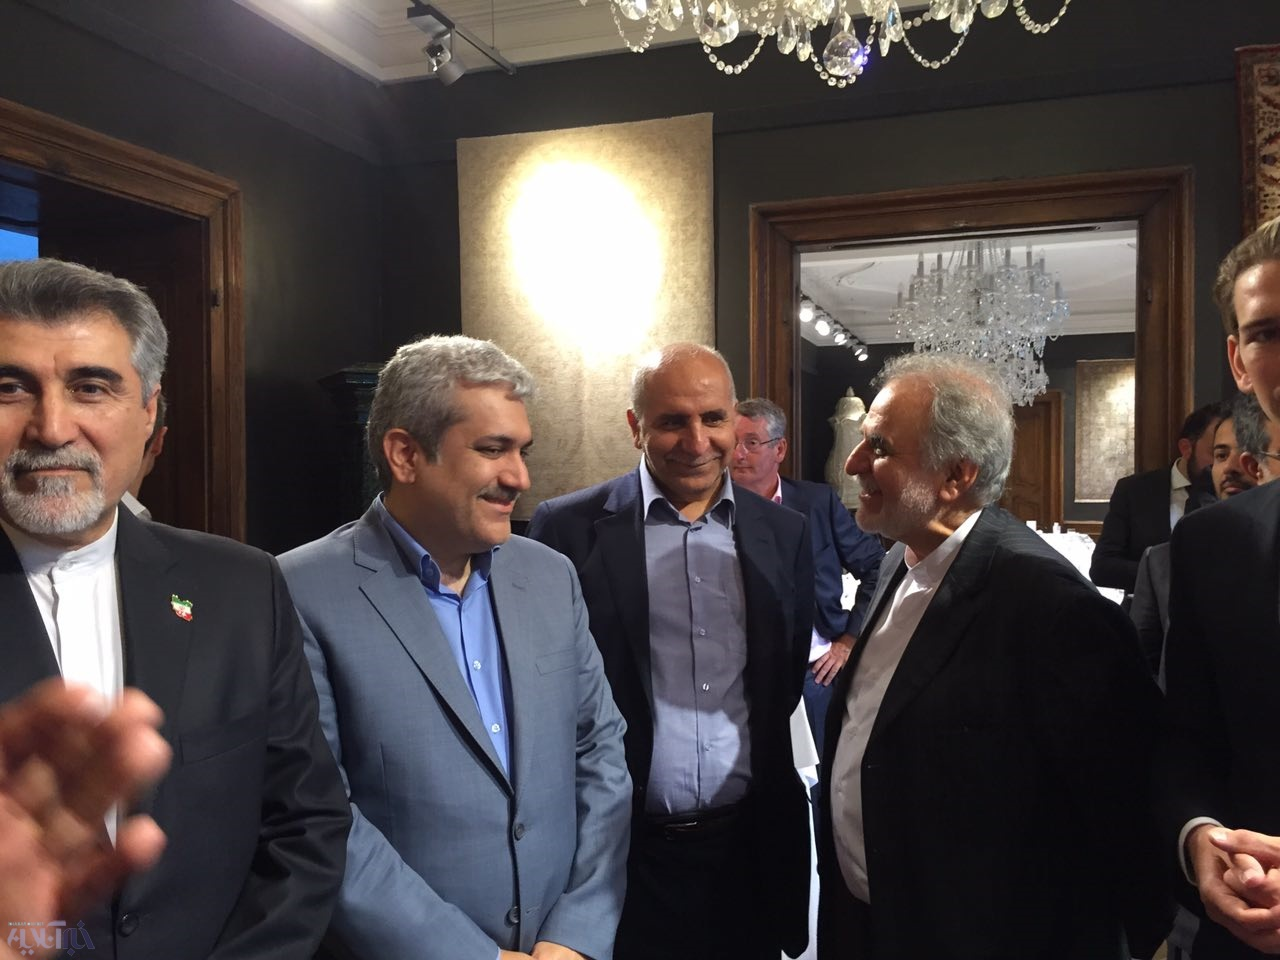 سورنا ستاری,اتریش,توافق هسته ای ایران و پنج بعلاوه یک